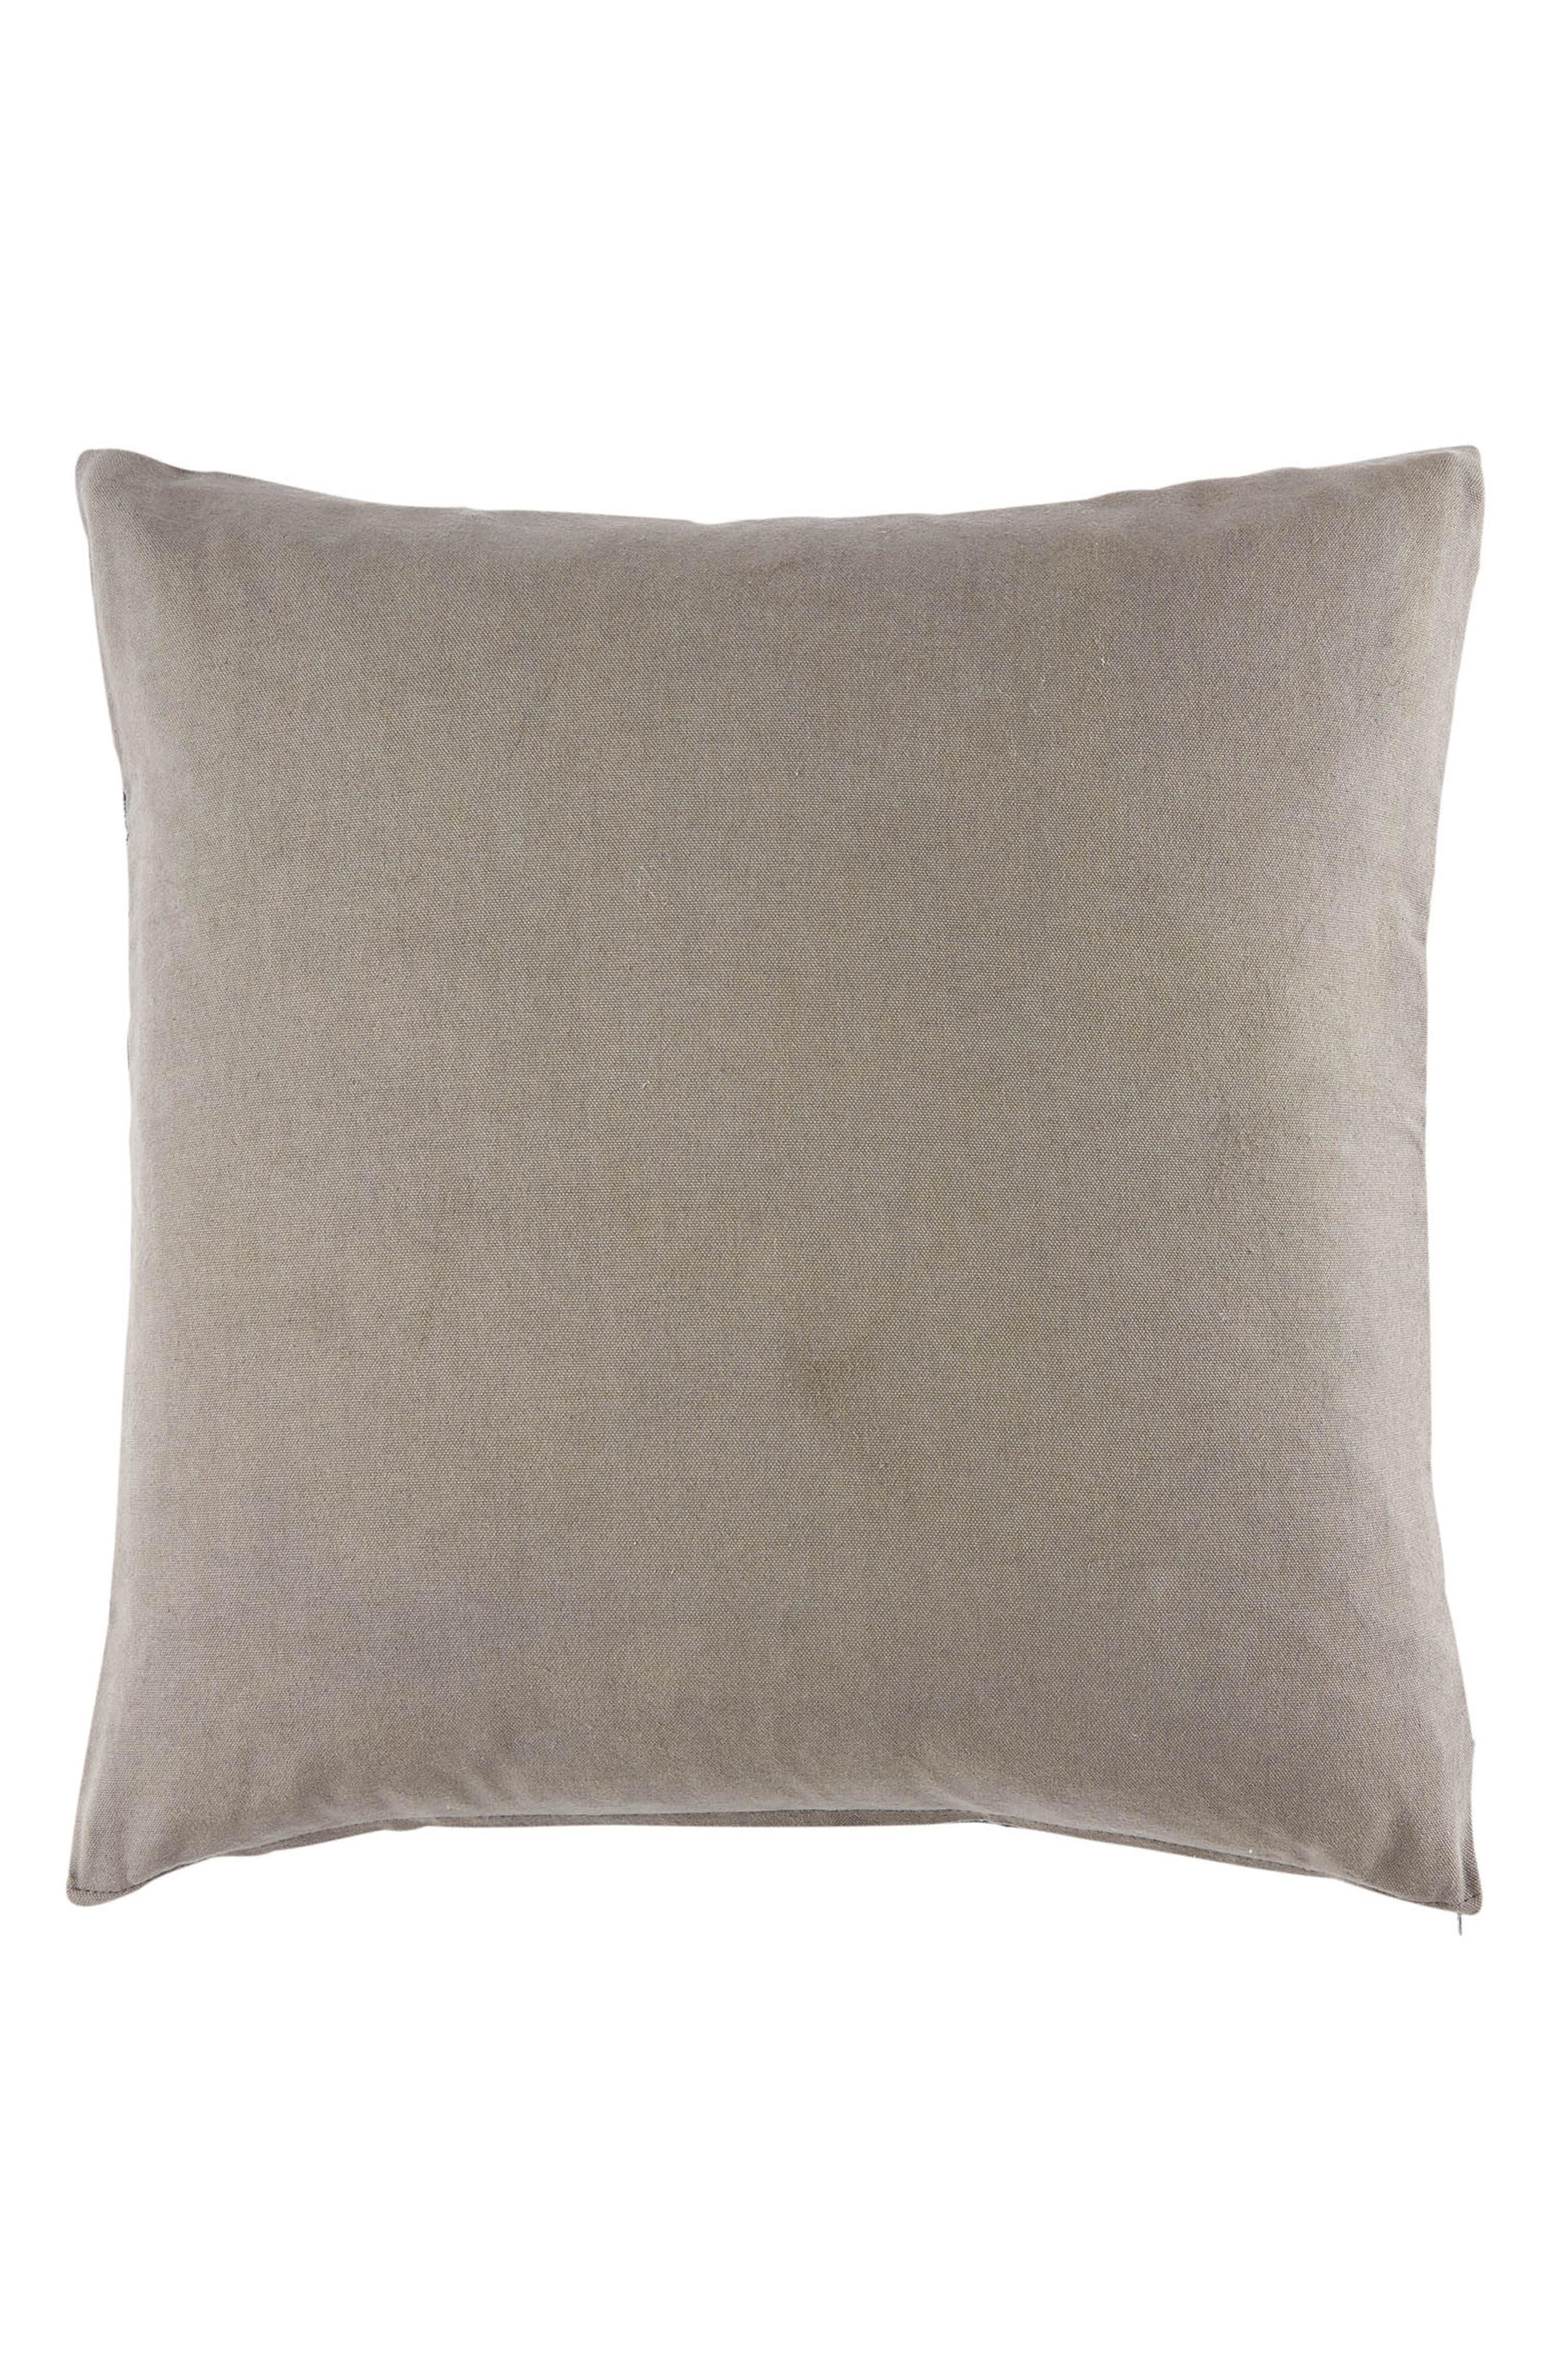 Peykan Pillow,                             Alternate thumbnail 2, color,                             Turtledove/ Bungee Cord